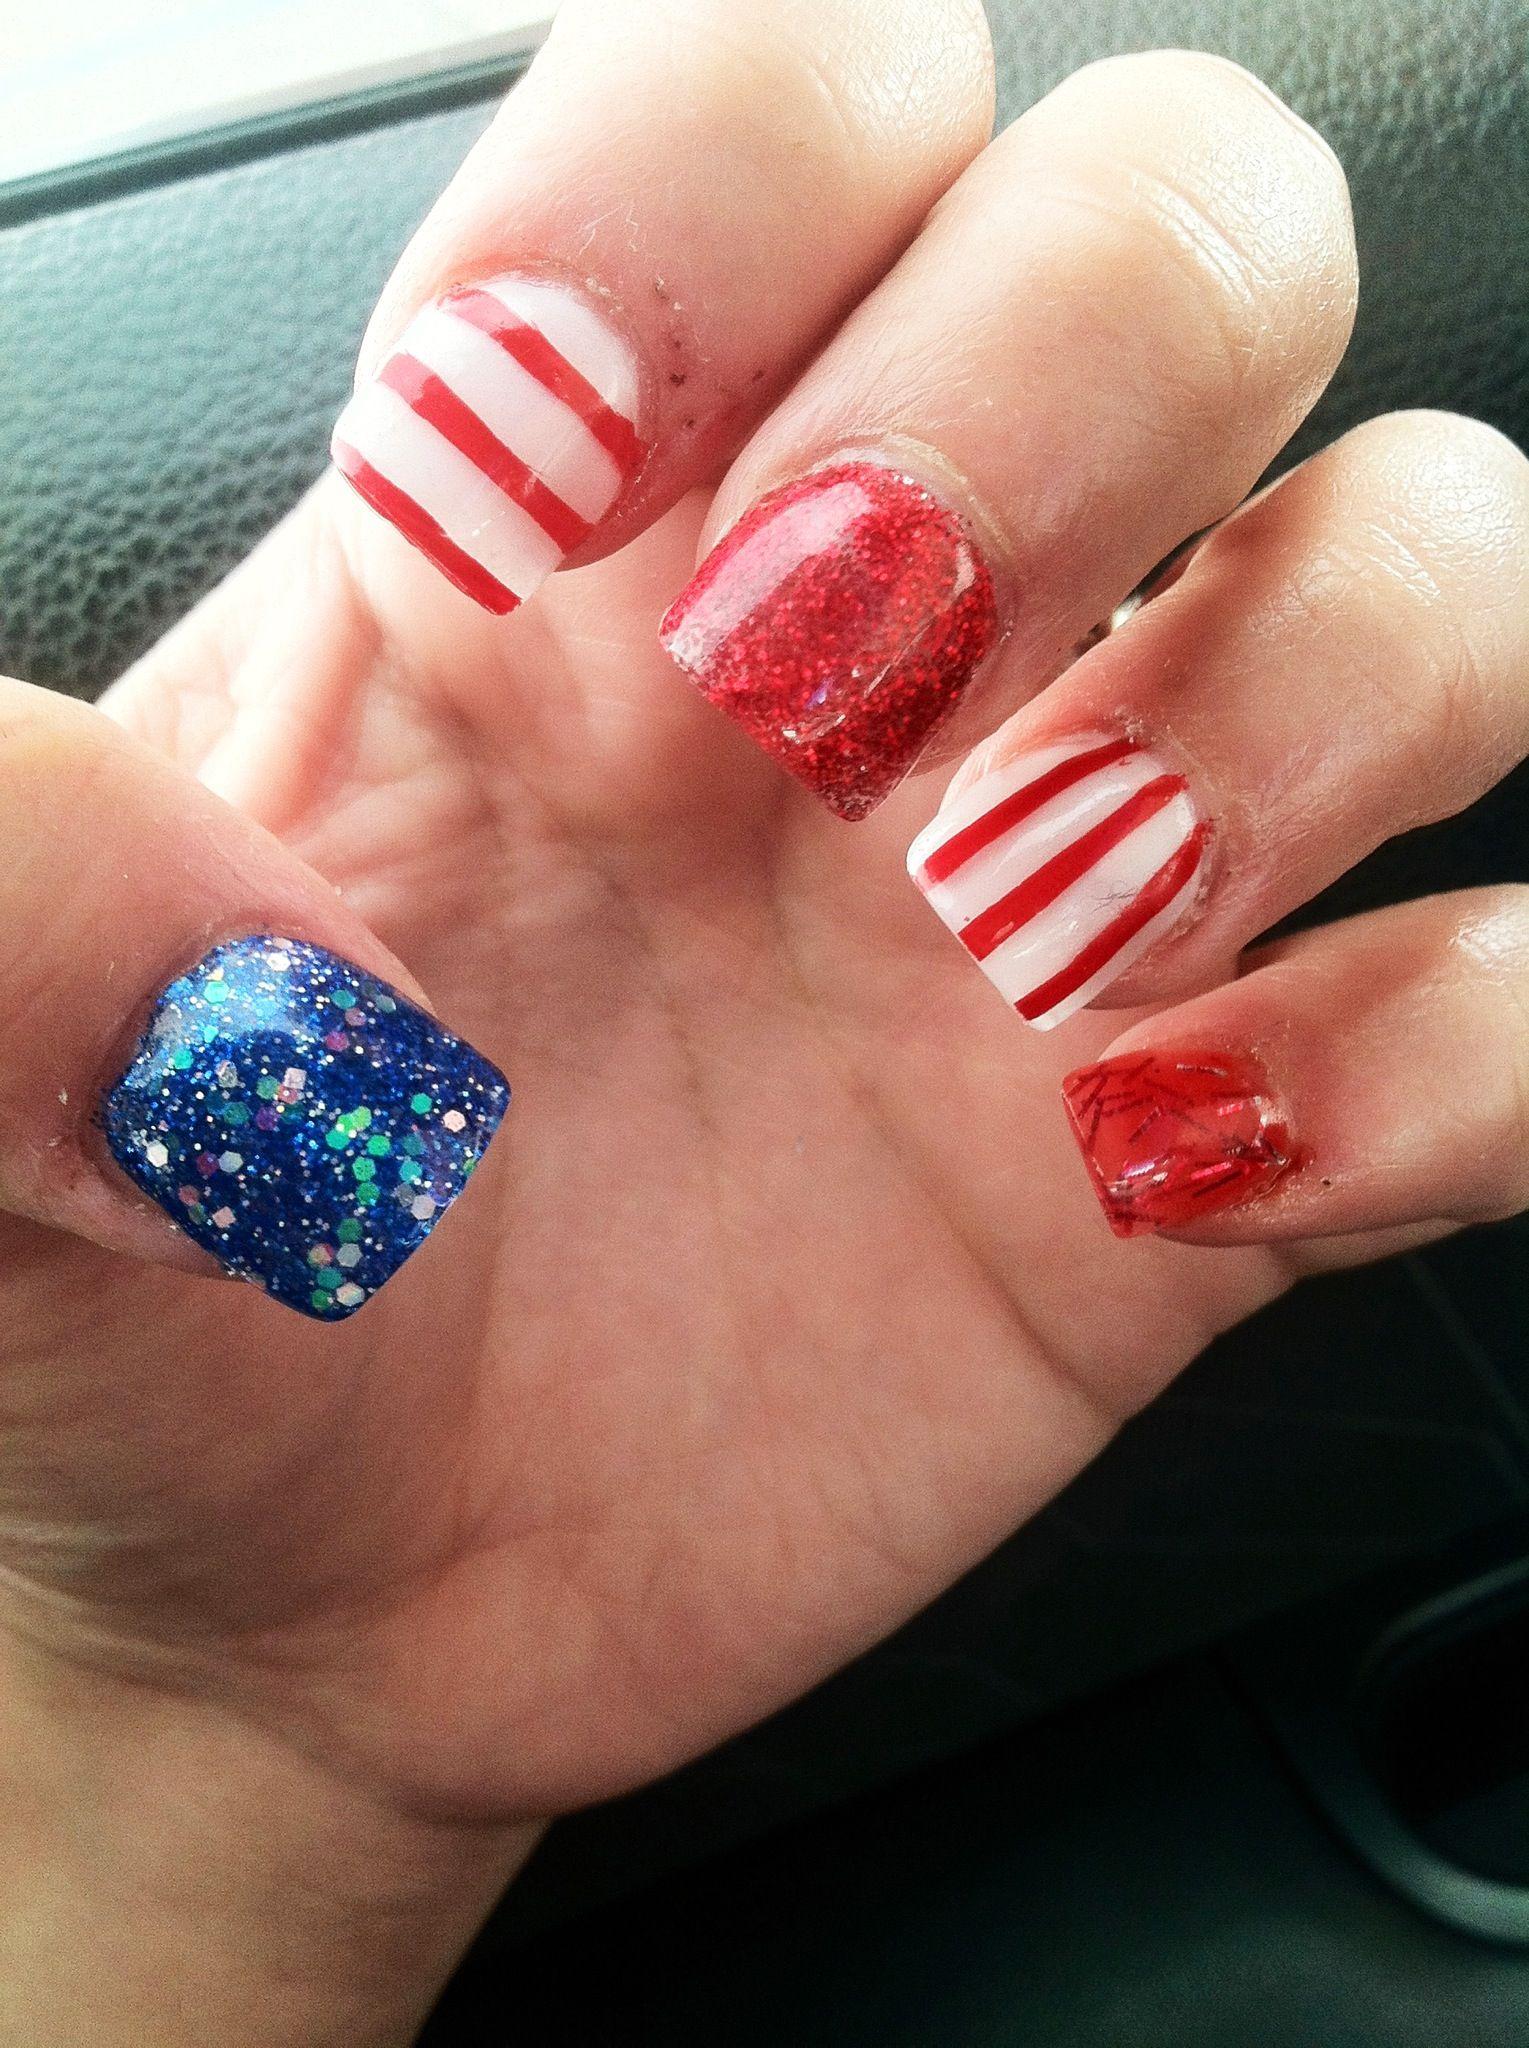 Festive 4th nails! #nails #nailart #america #4thofJuly